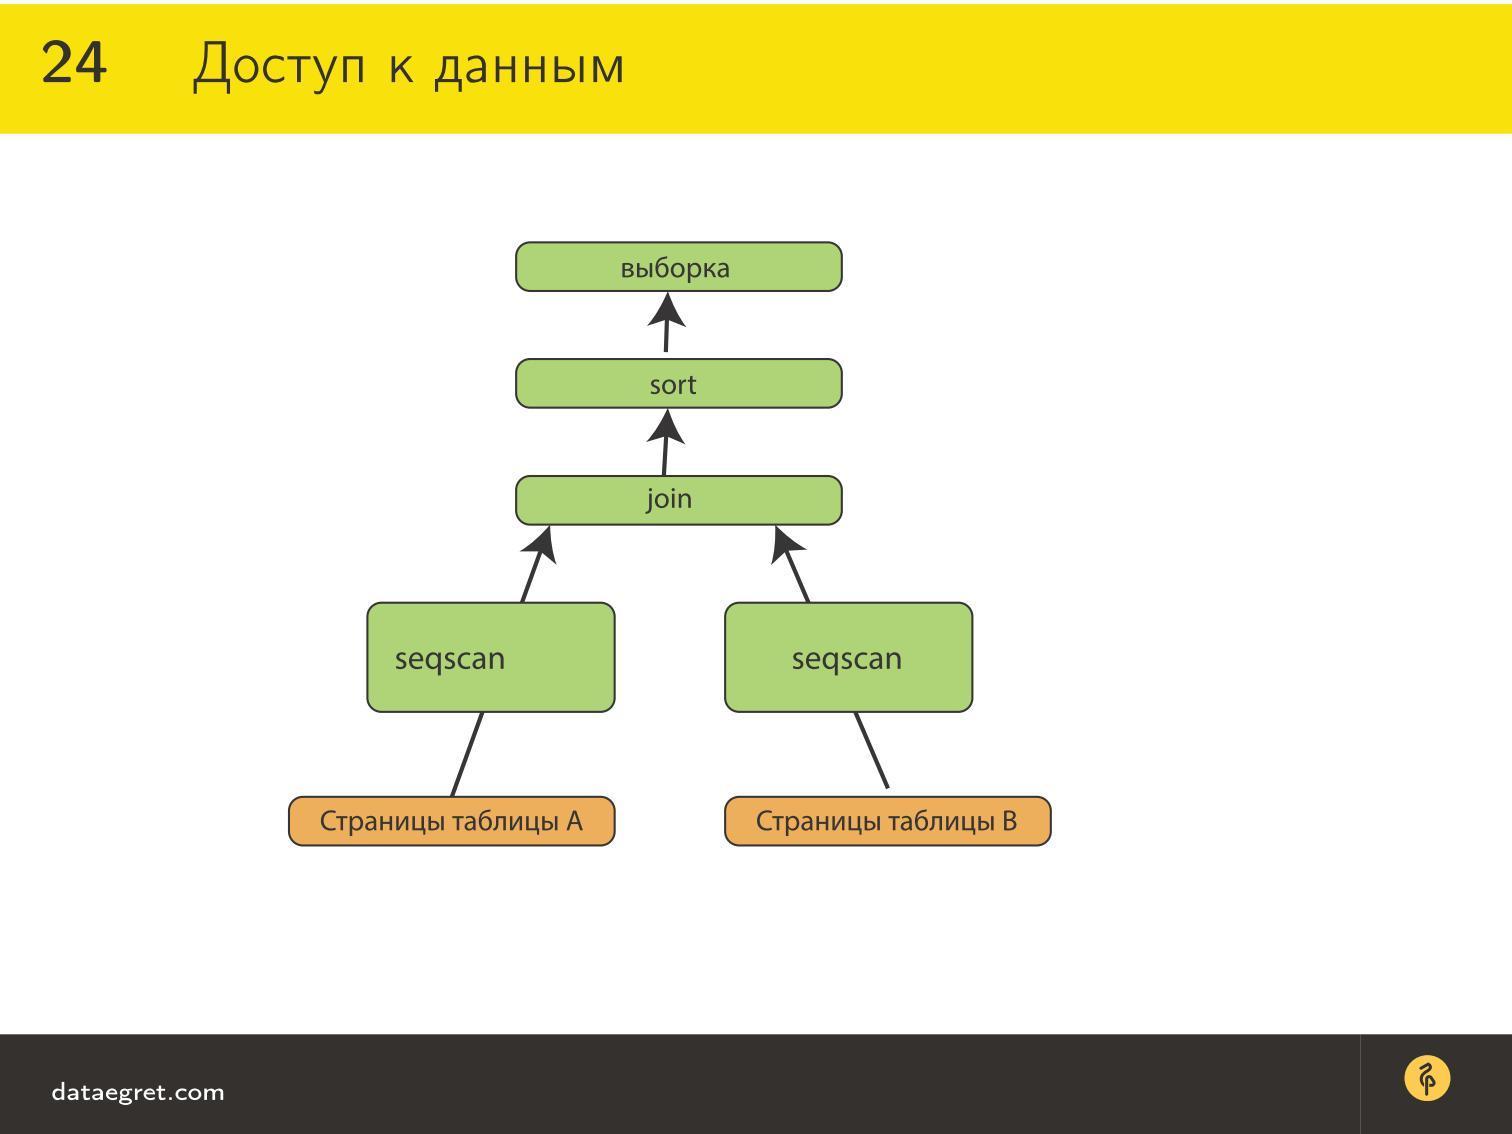 структура базы данных предприятия алгоритм взаимодействия связи